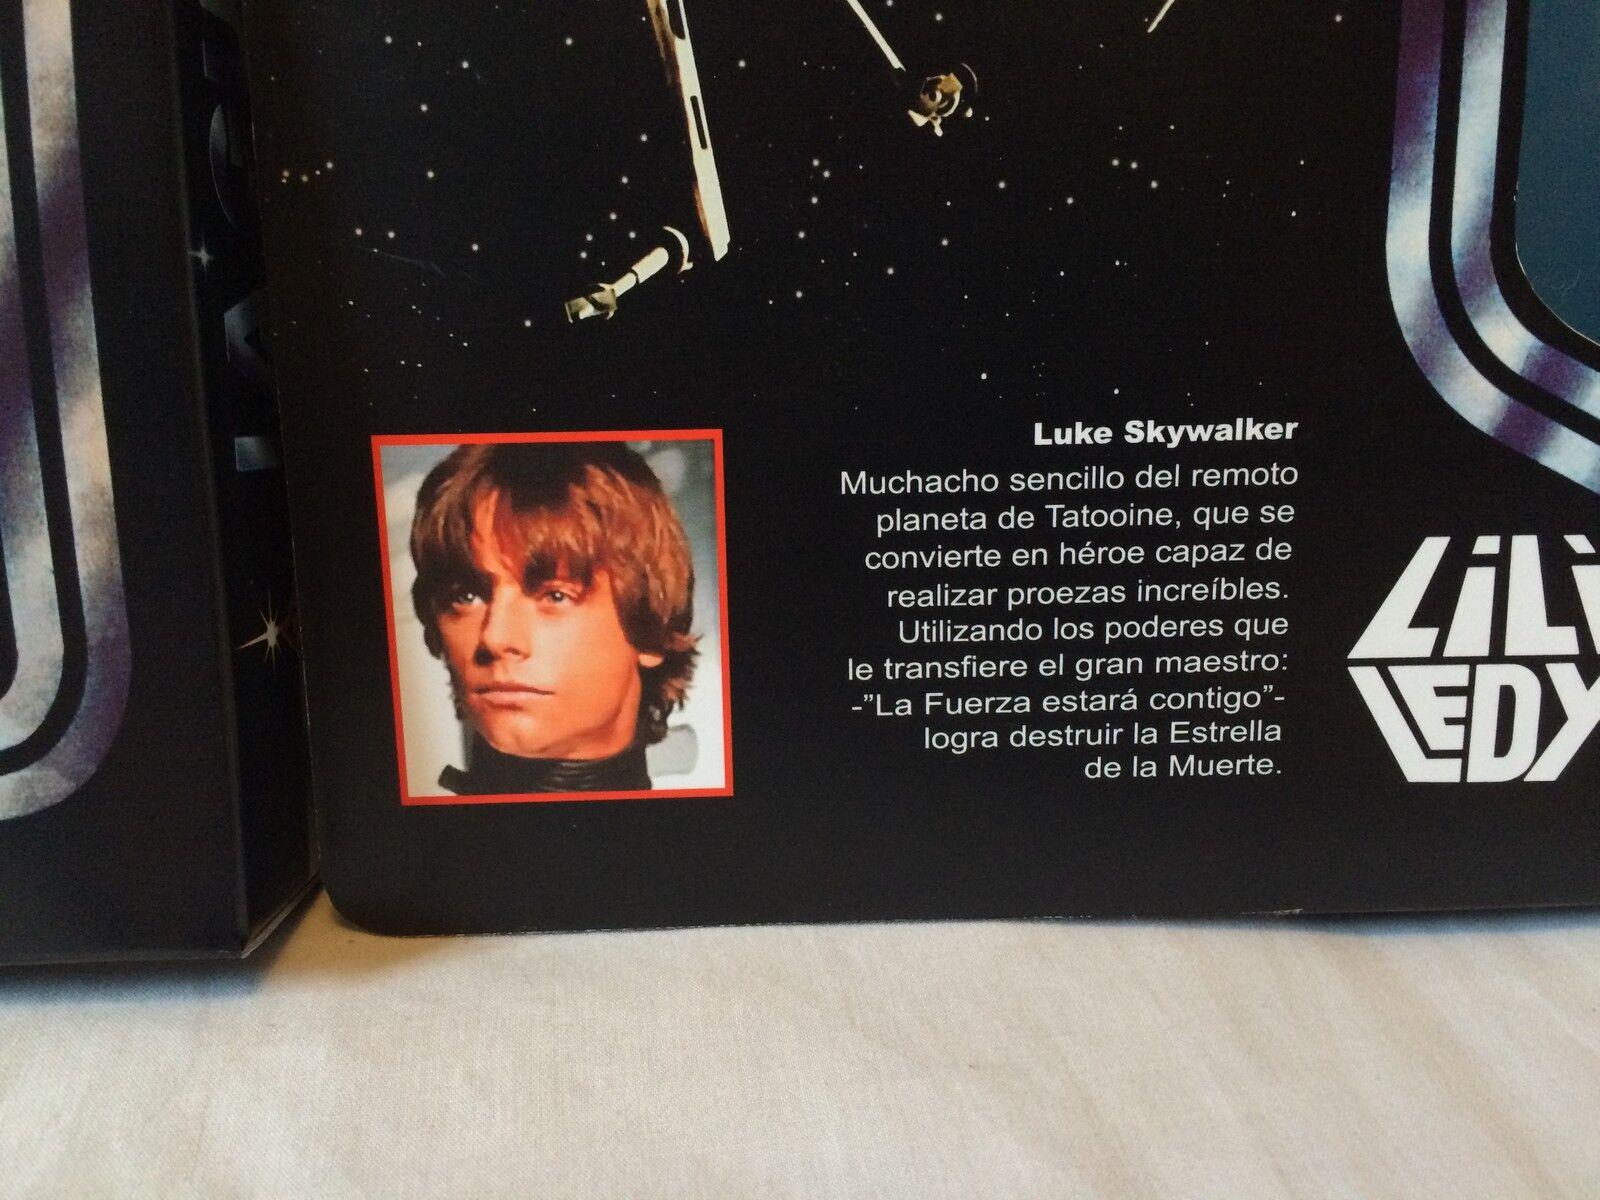 Replacement vintage Star Wars 12    lili ledy luke skywalker box + inserts 66070e